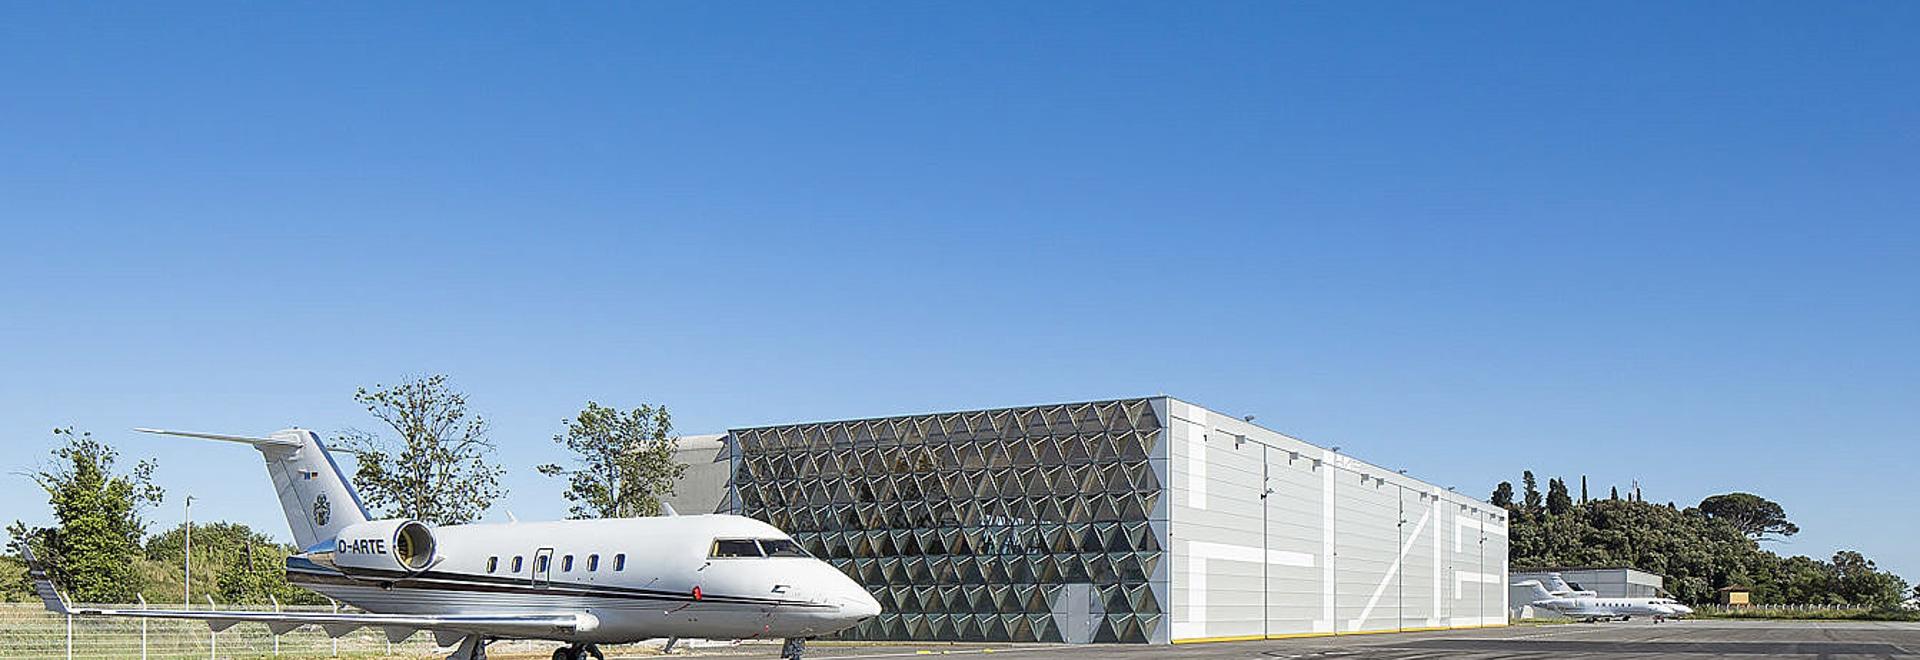 Innovative Aircraft Hangar Doors From Champion Door